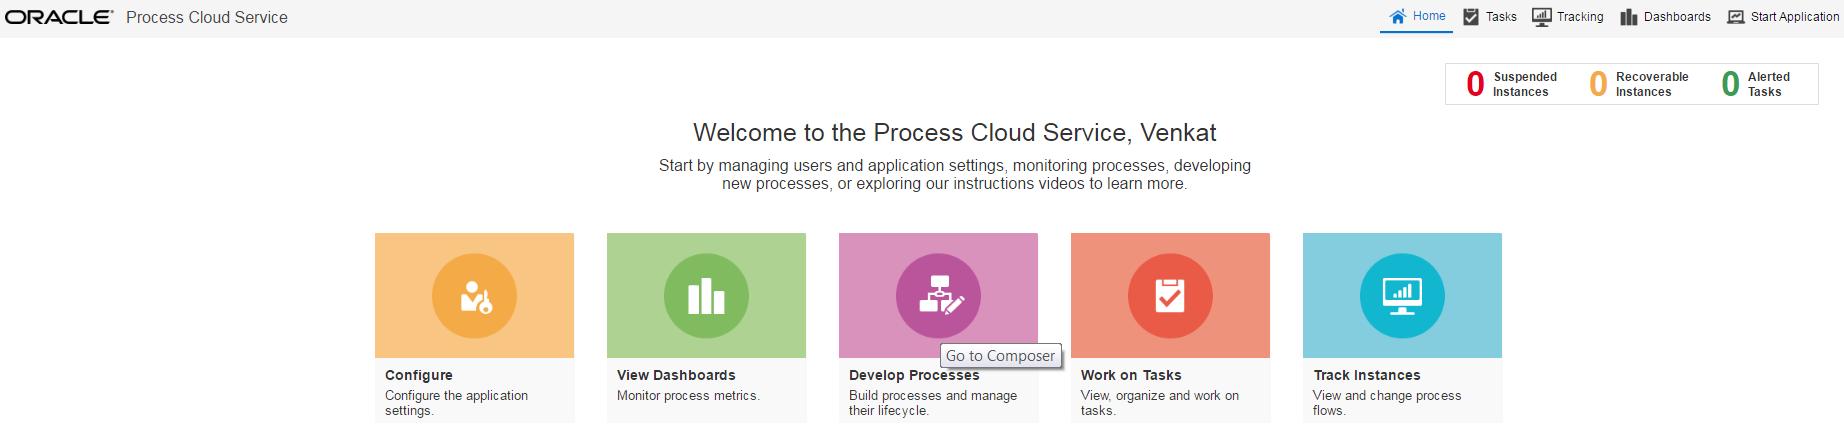 develop_processes.png